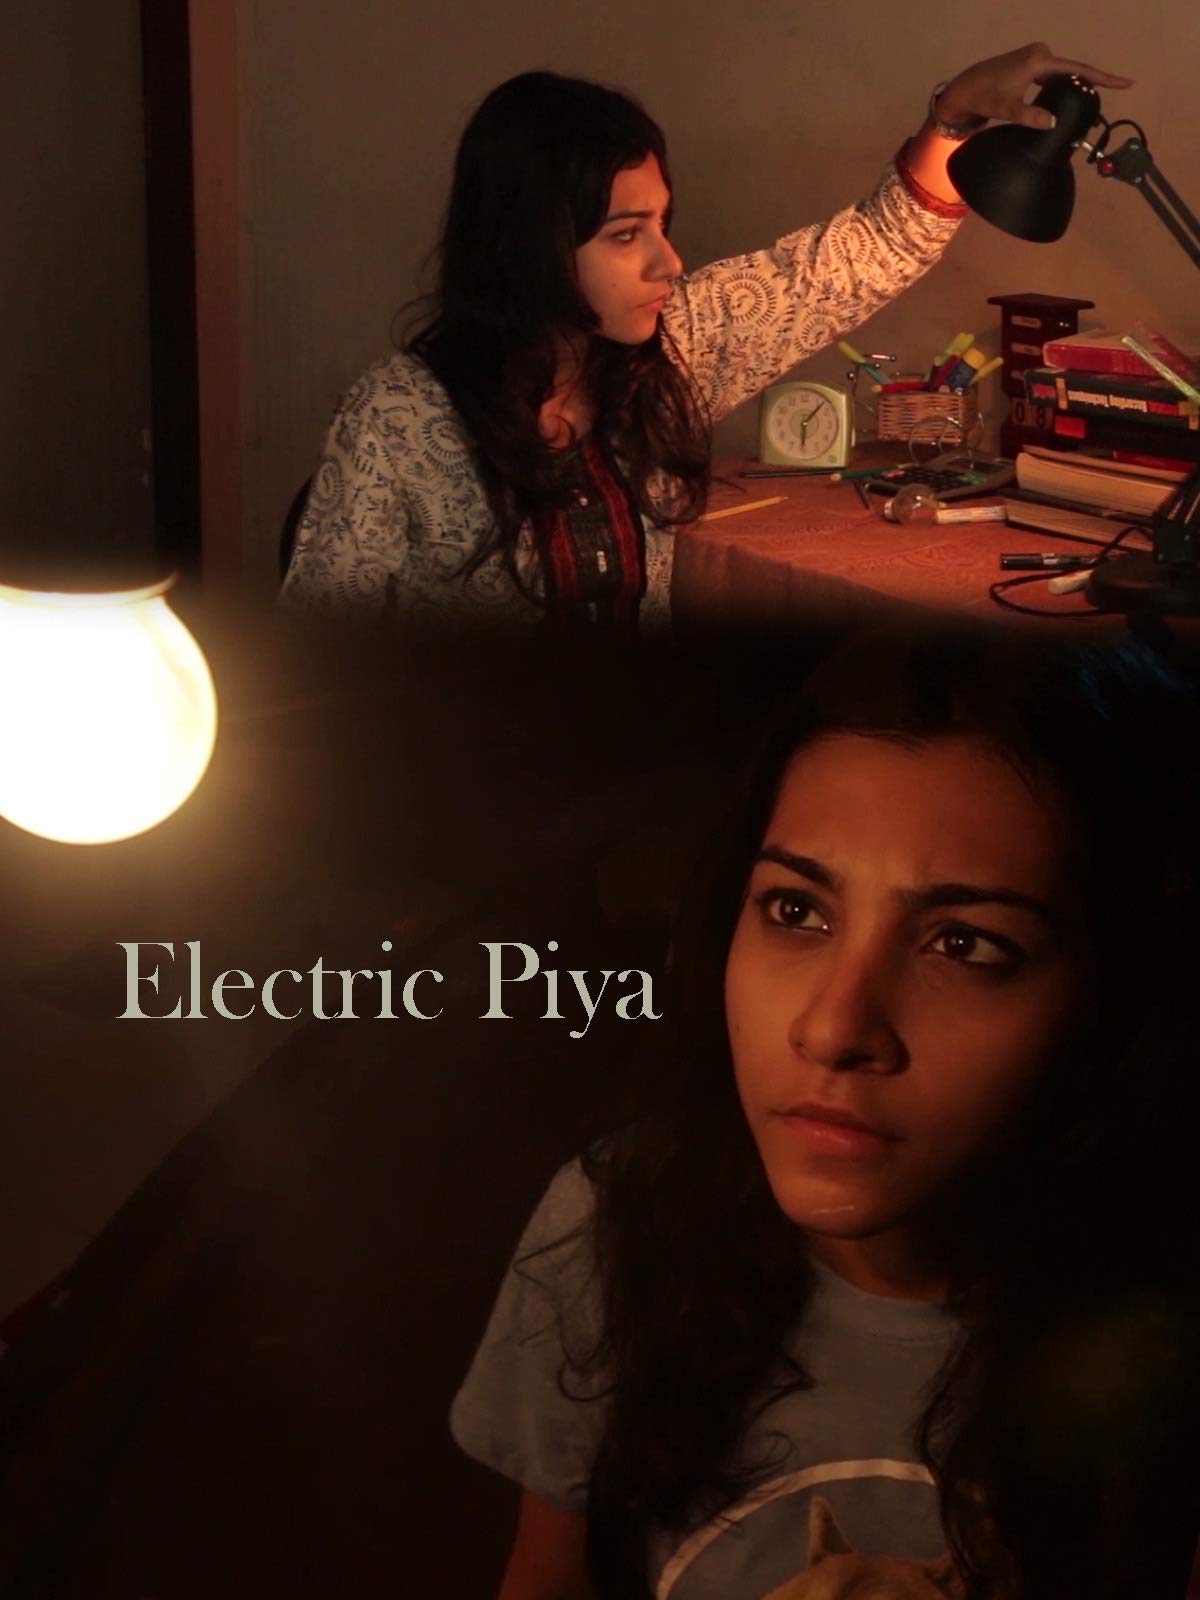 Electric Piya